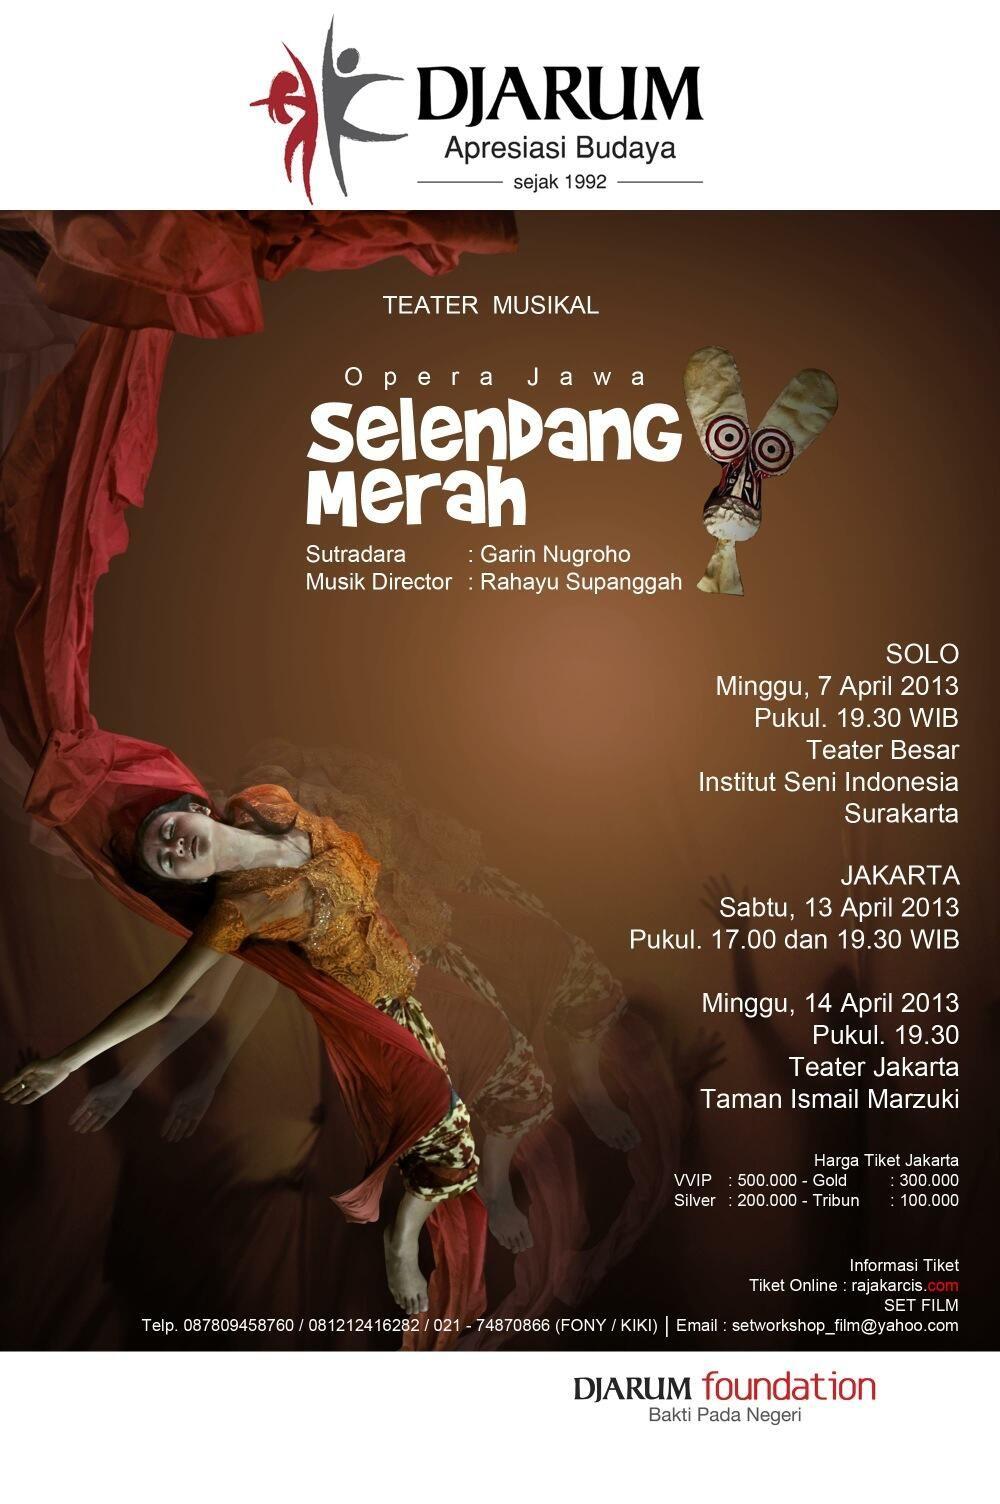 The latest from awardwinning Indonesian film director